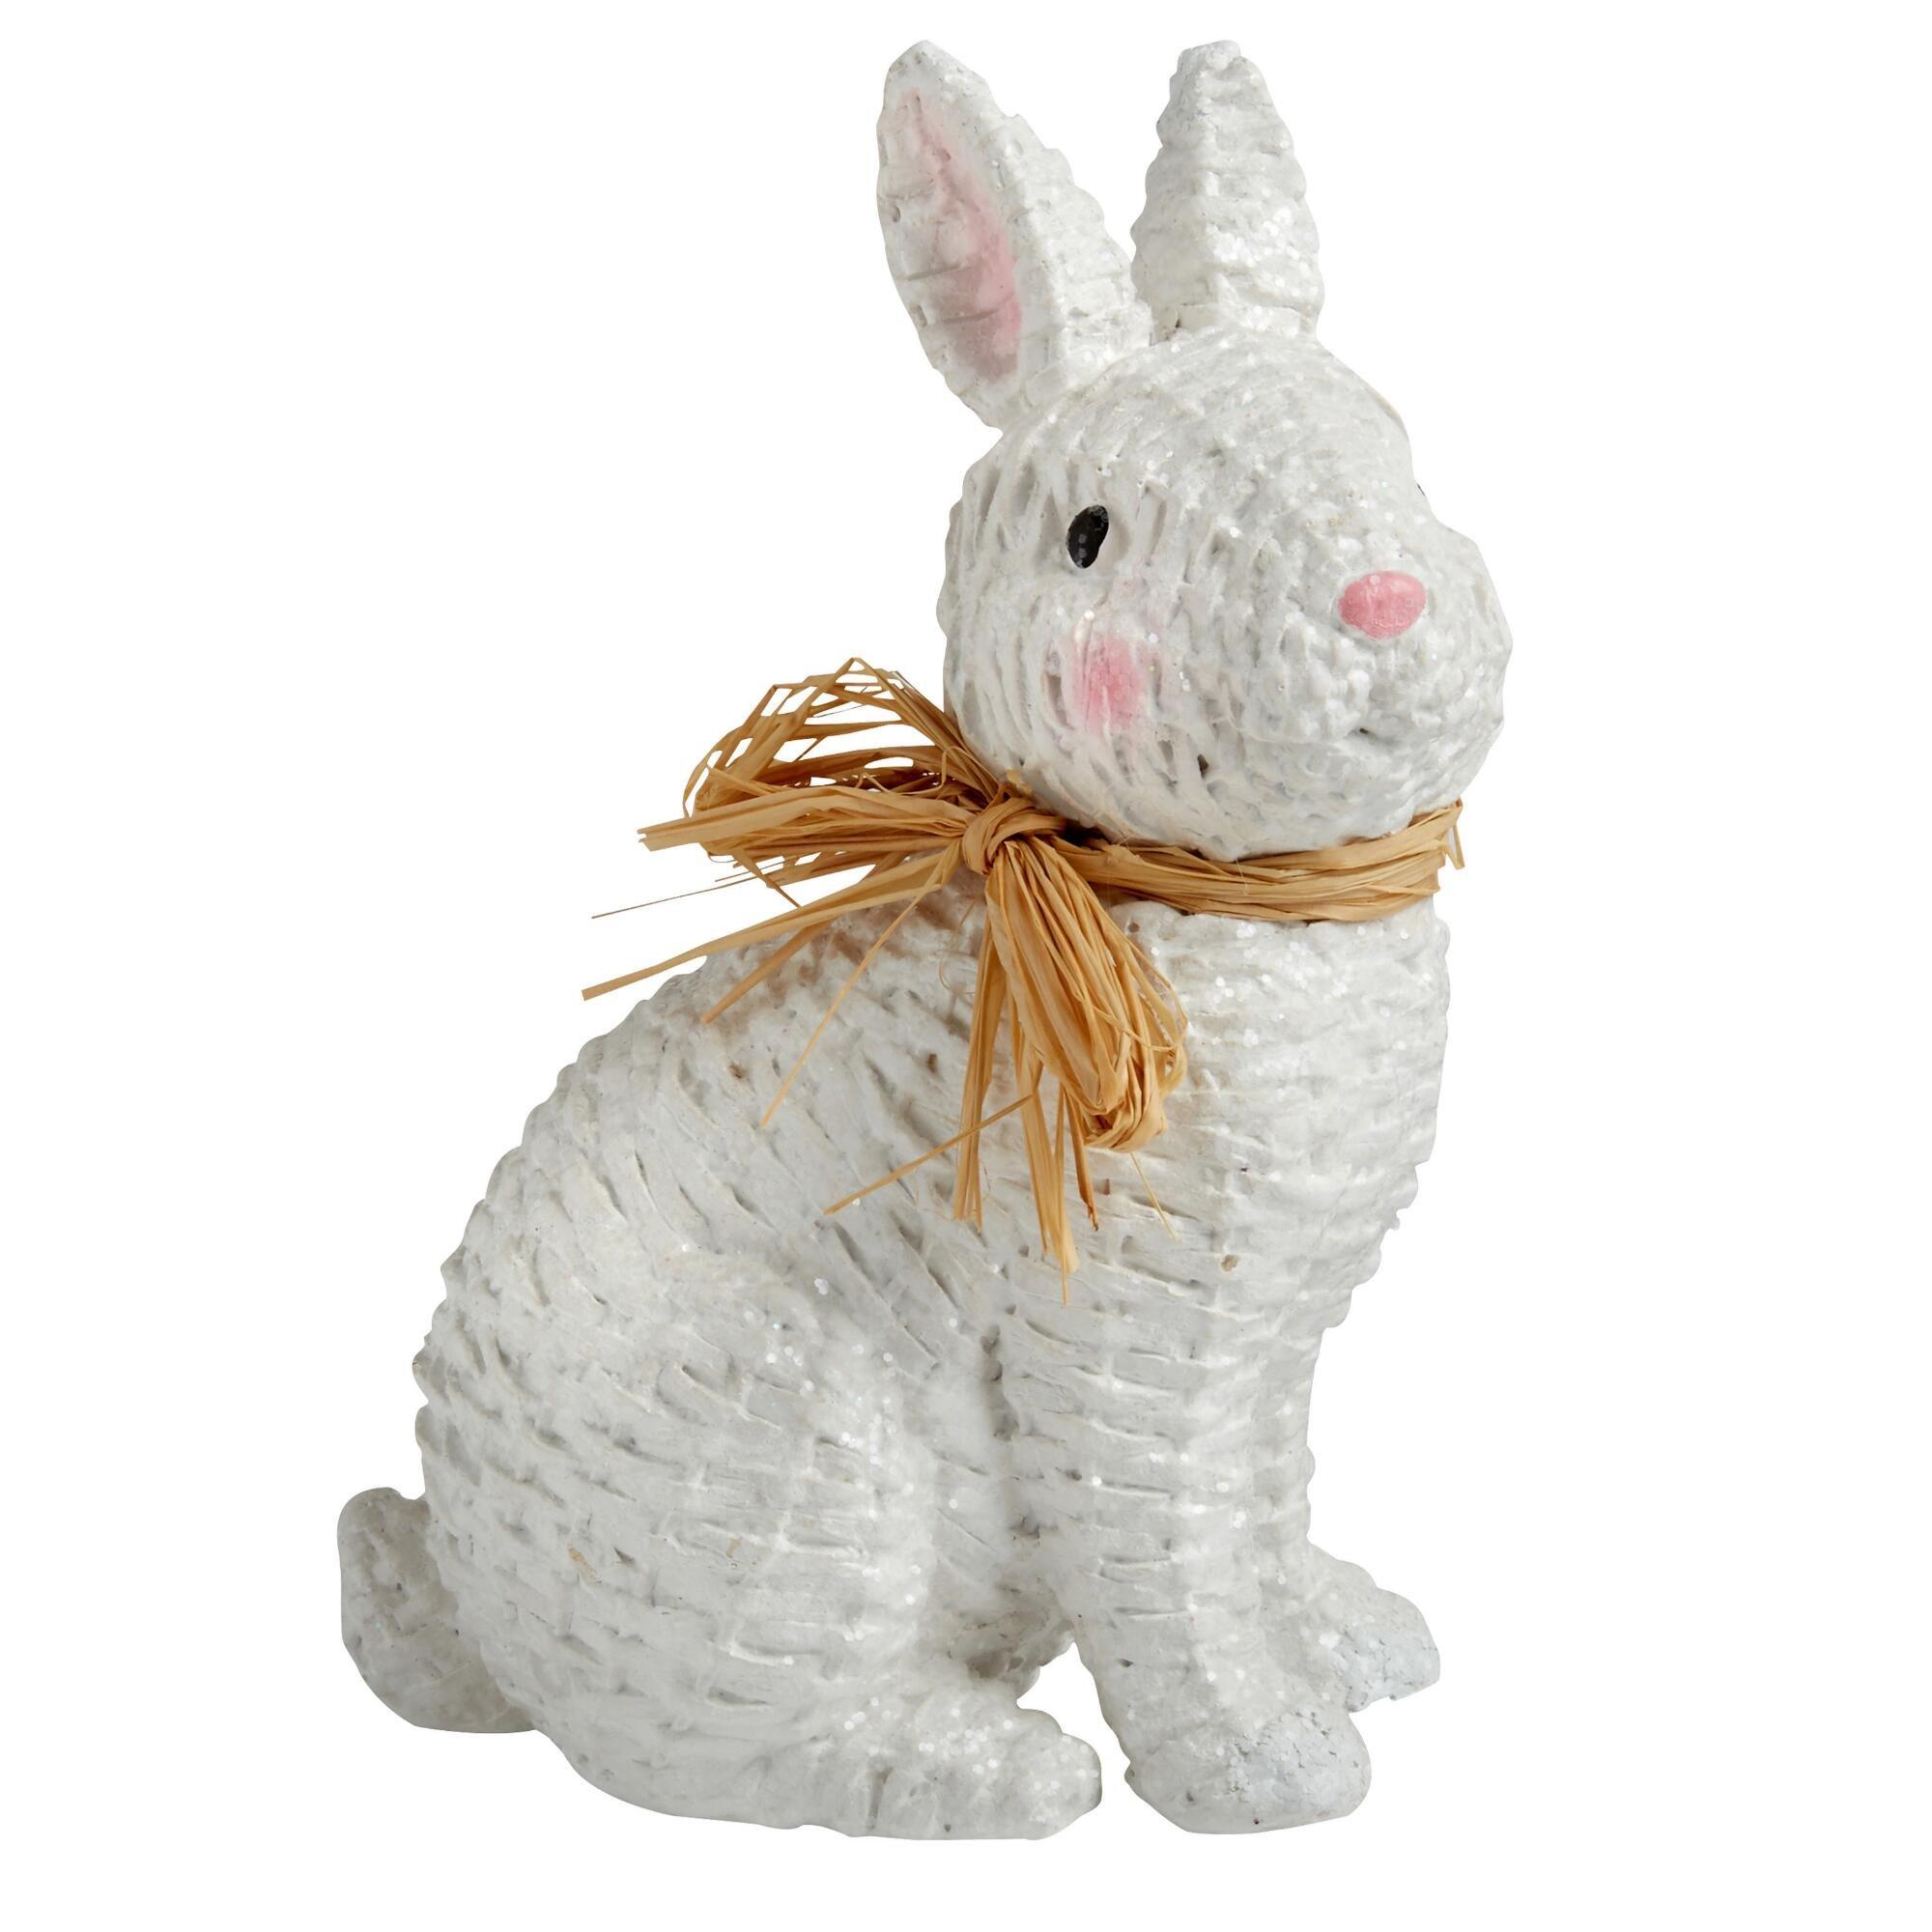 Nantucket Home White Basketweave Easter Bunny Figurine, 8-Inch